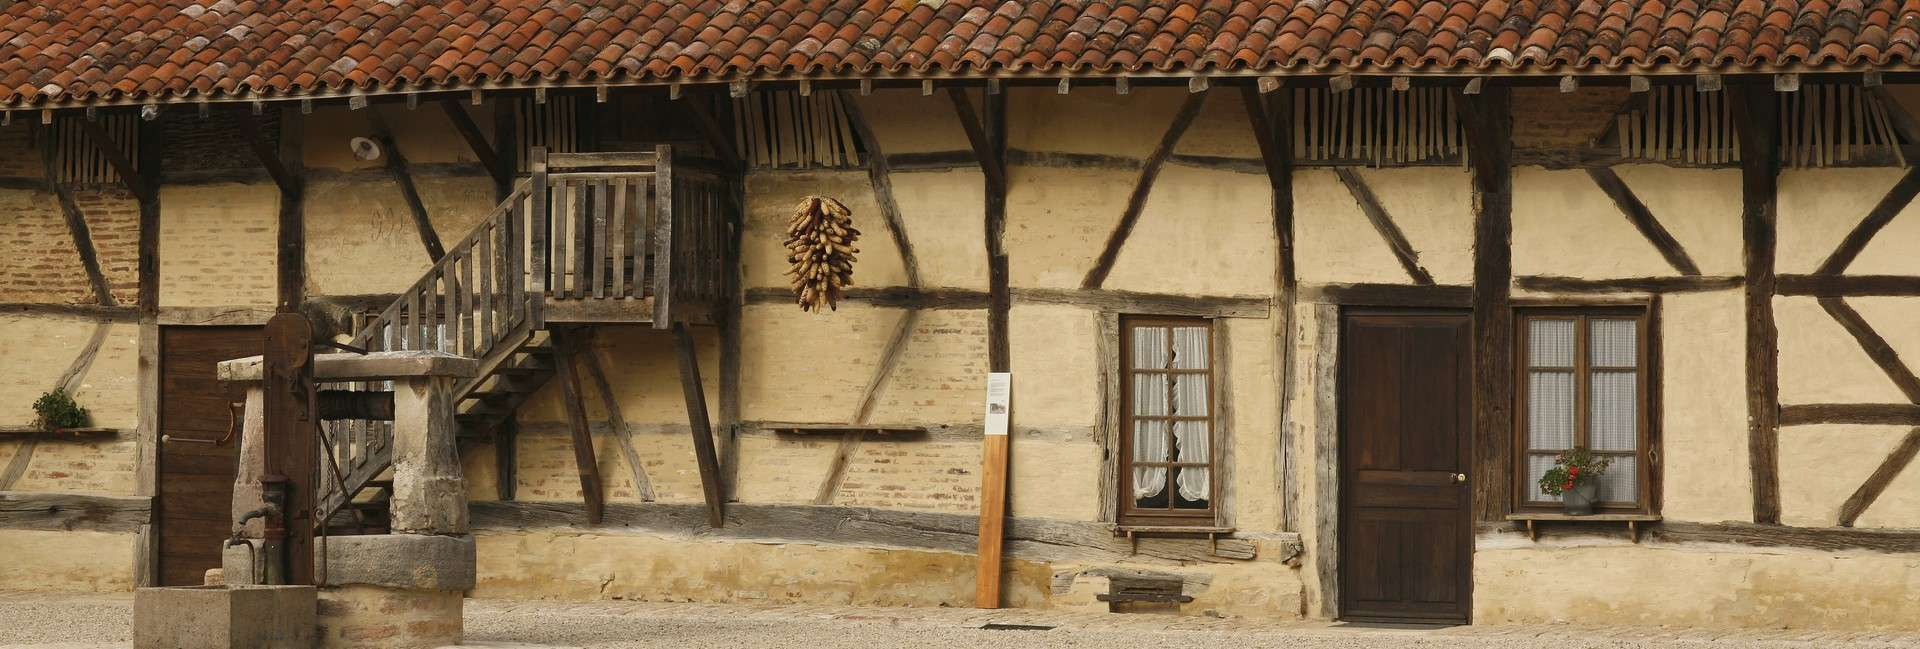 Ferme du Champ Bressan - Romenay - E-Brenckl